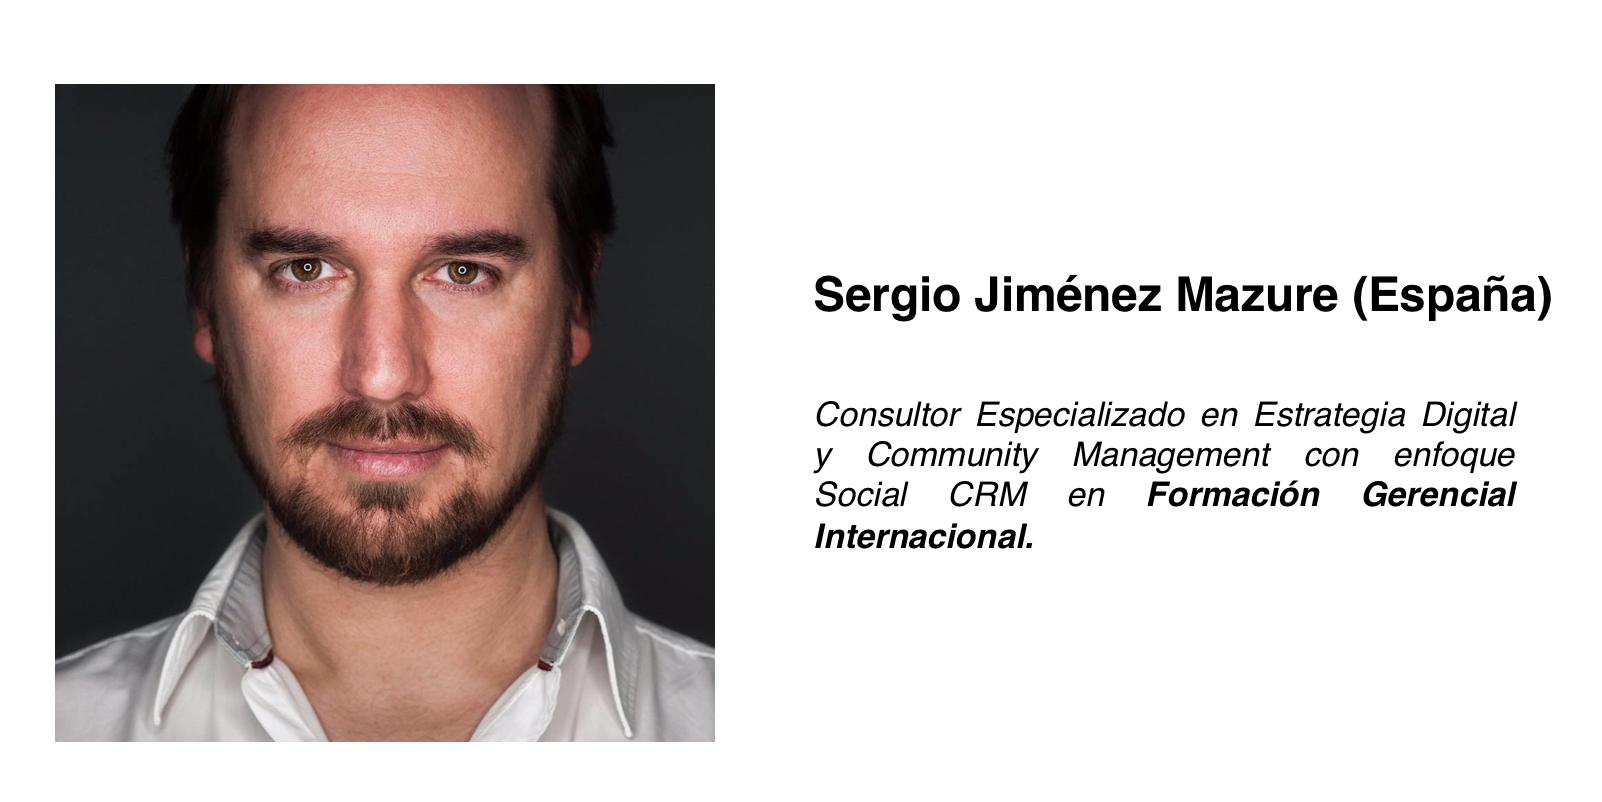 Entrevista: Community Management. Sergio Jiménez Mazure